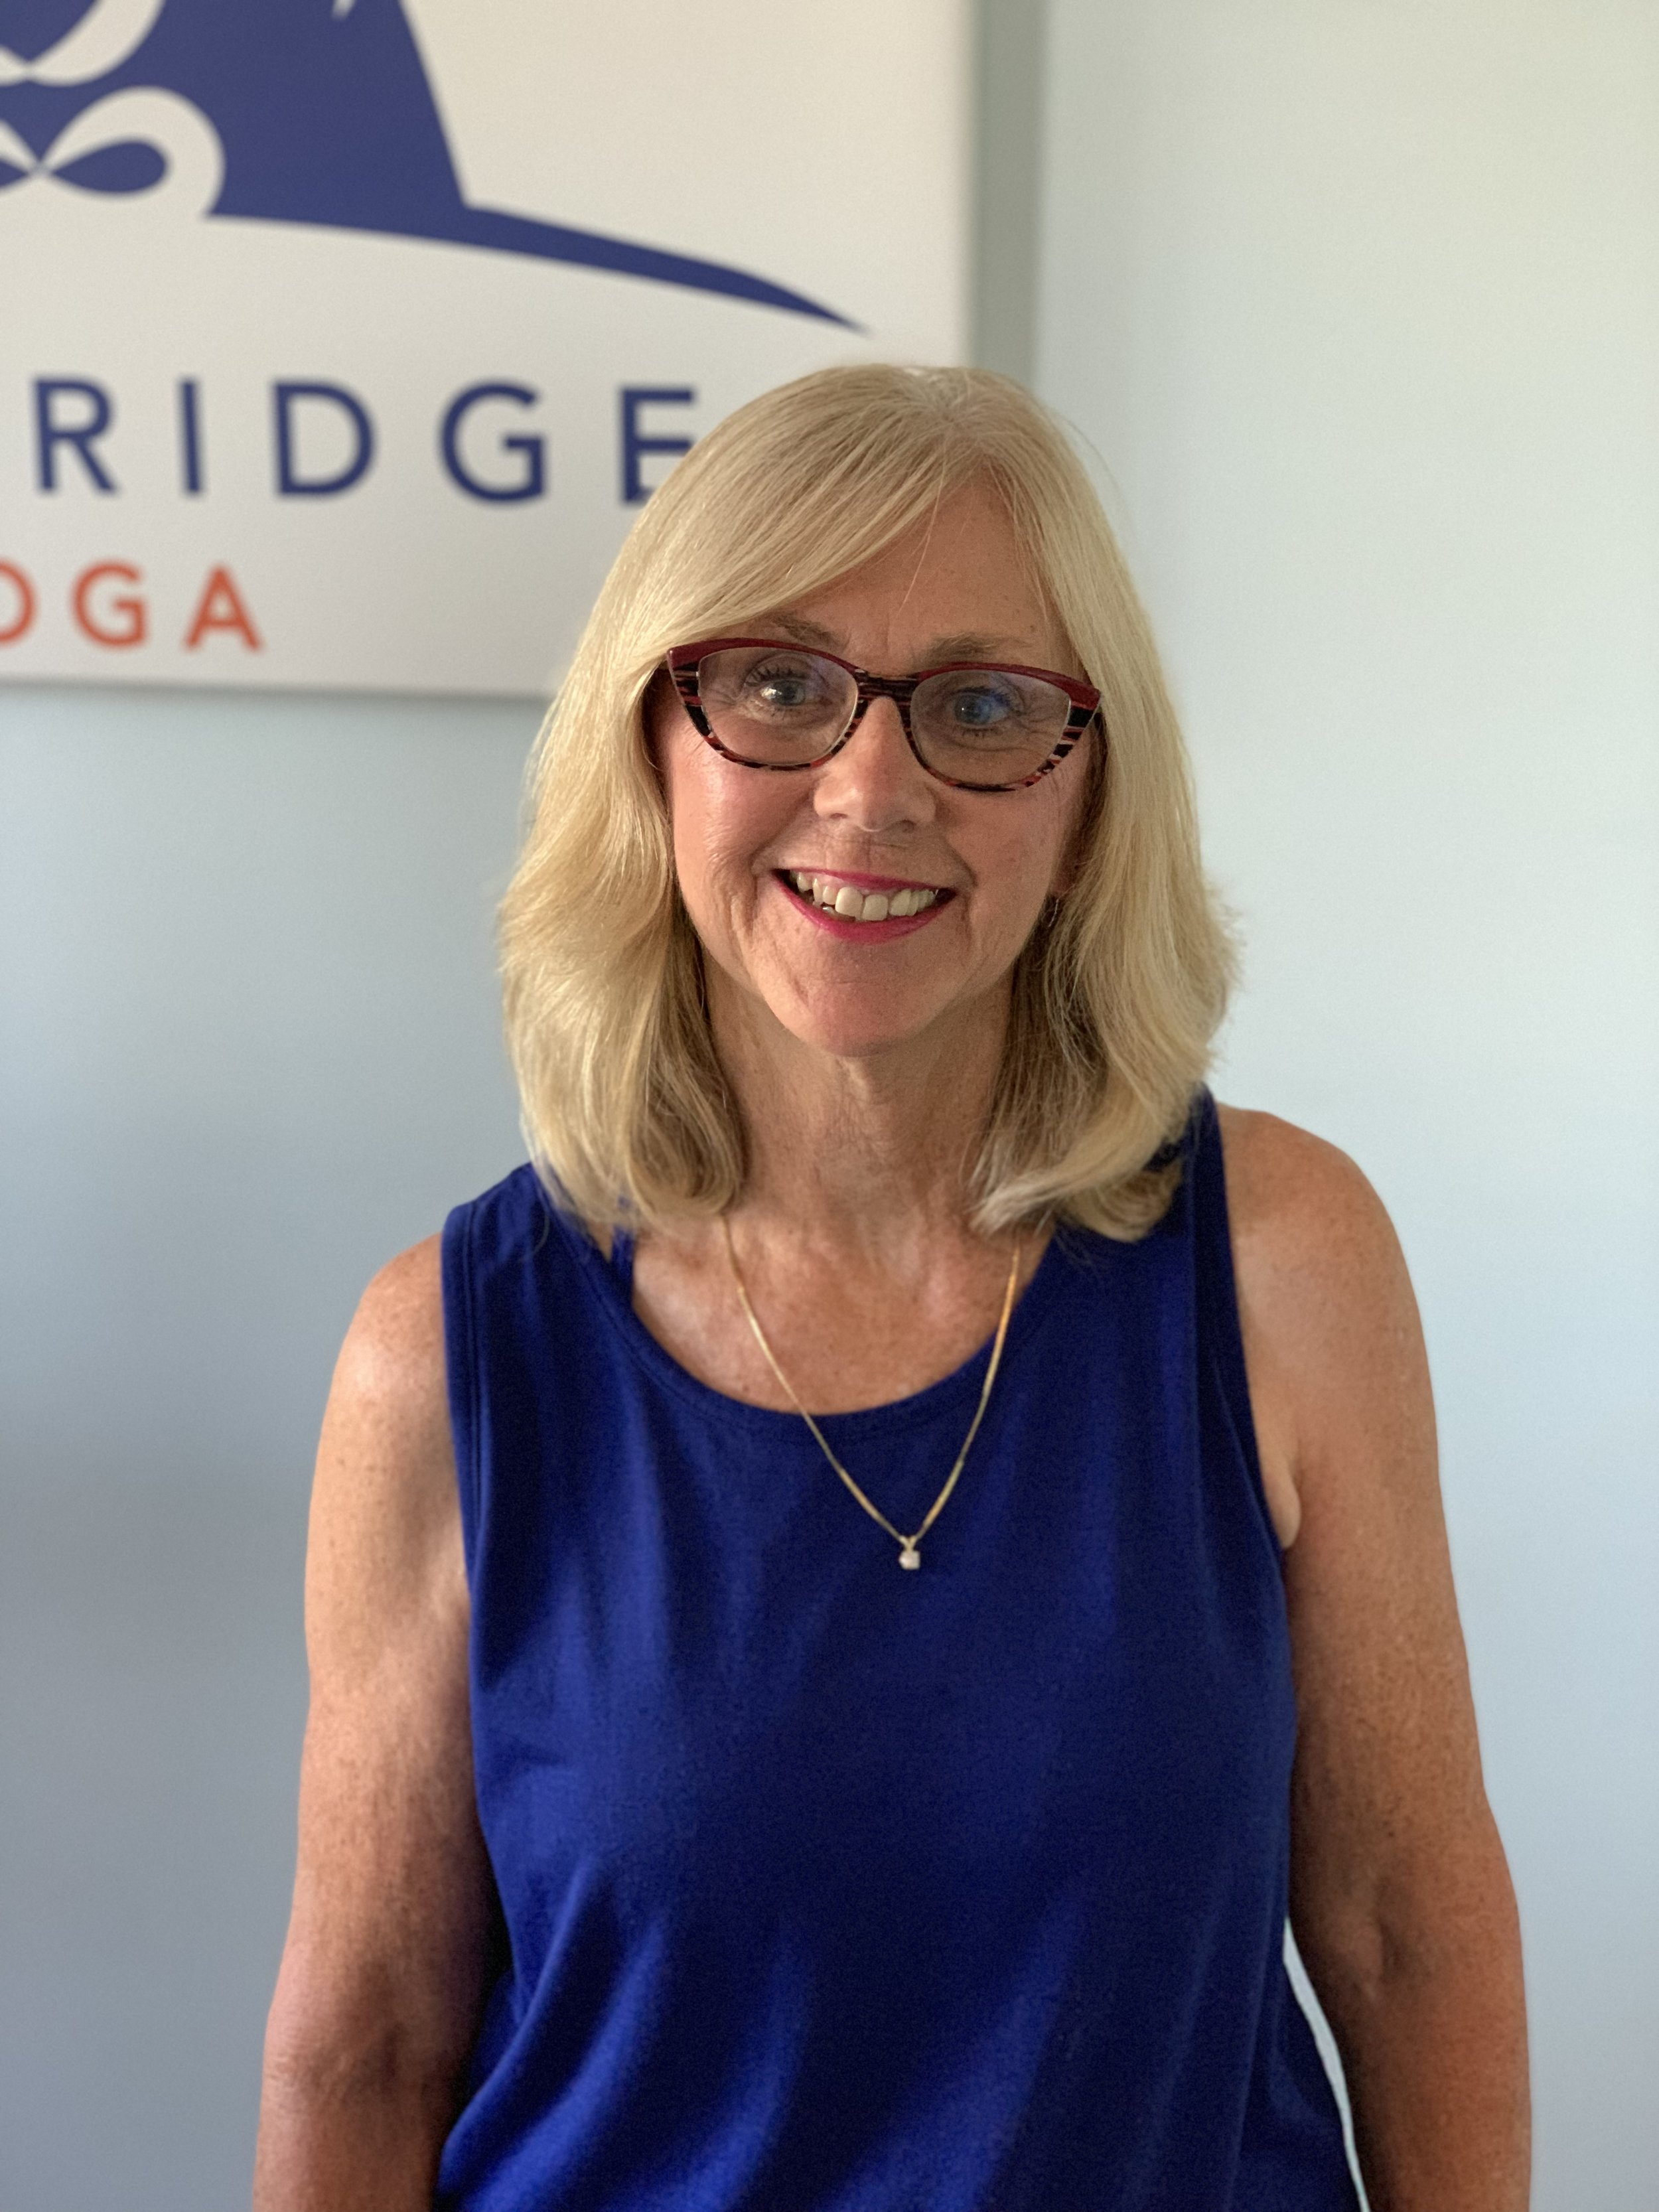 blue ridge yoga marian massage therapist.jpg